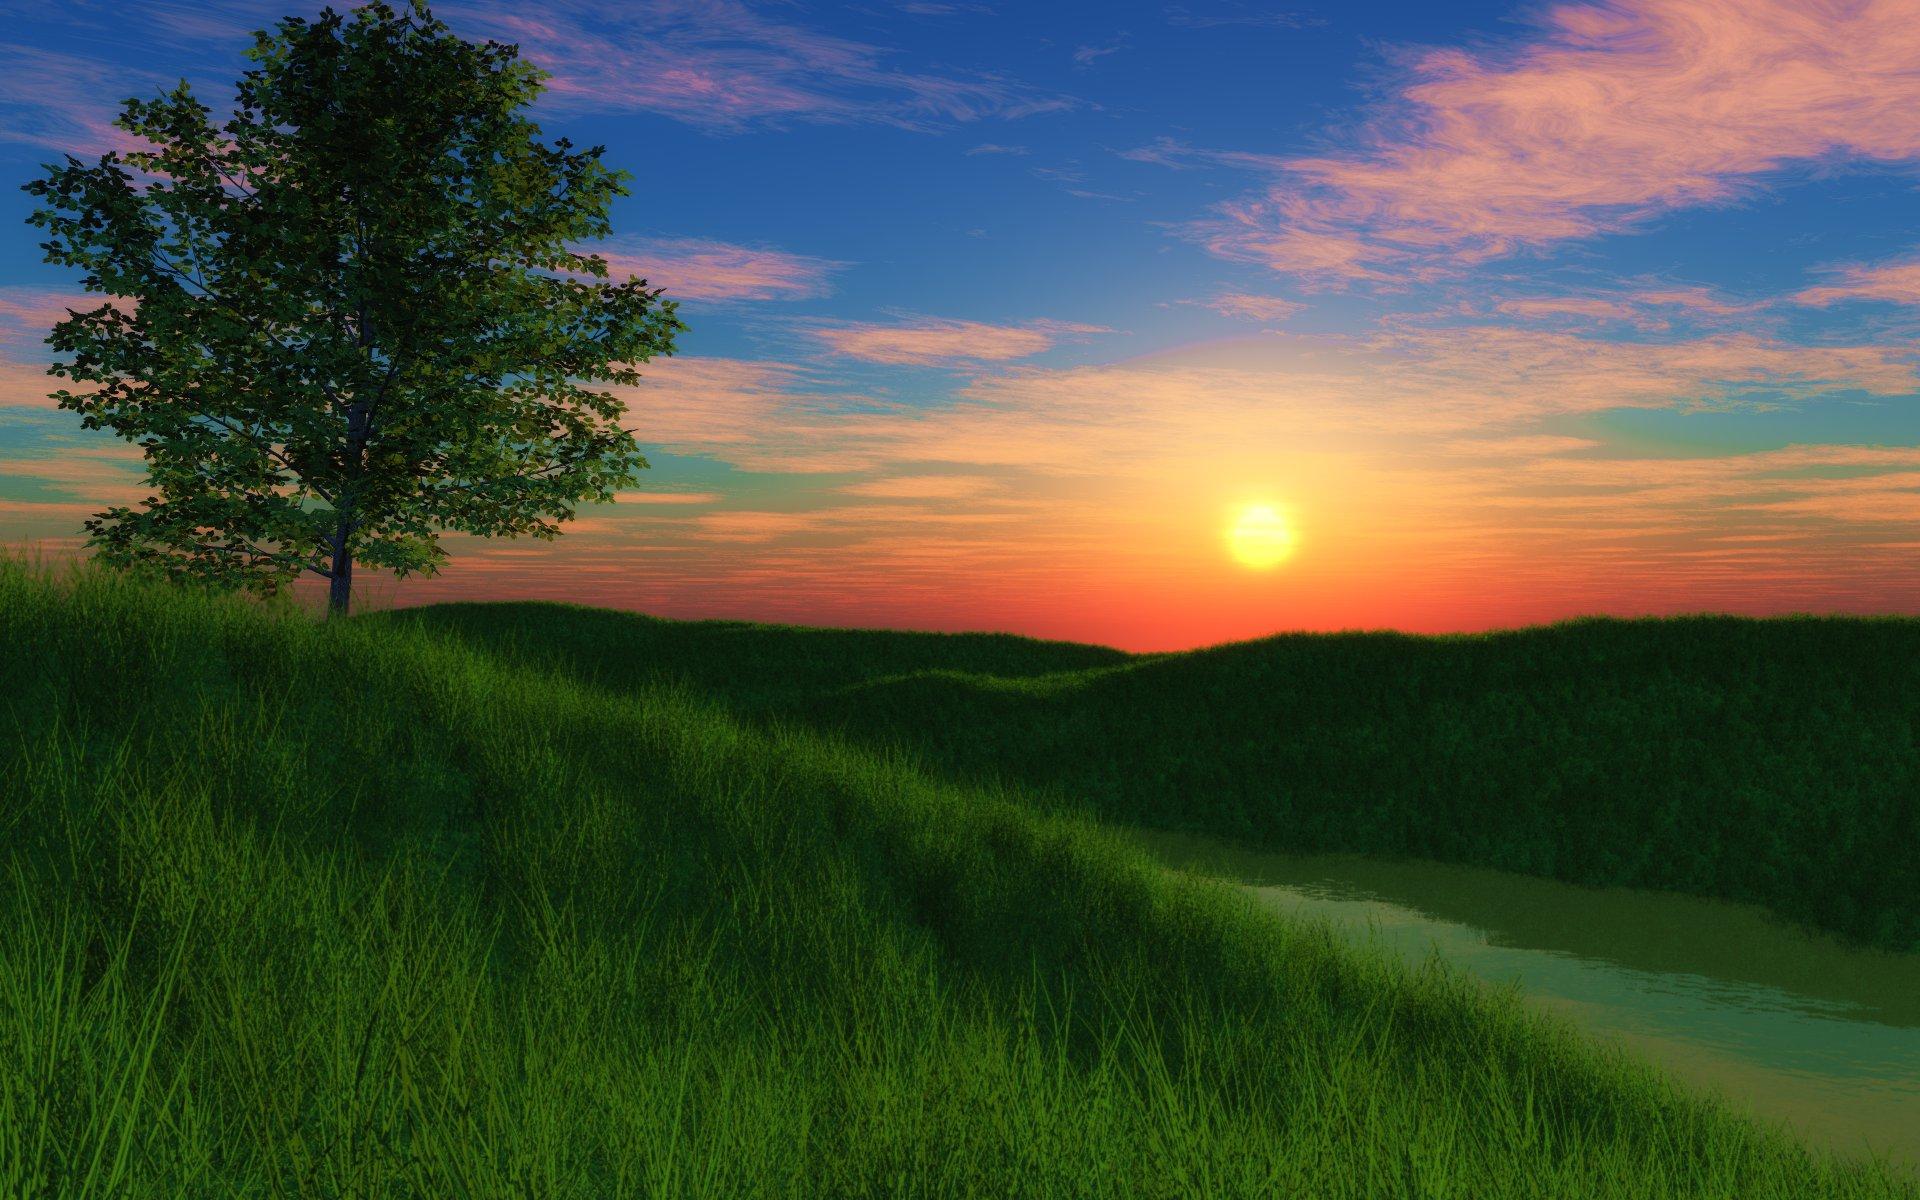 Grassy Hill Sunset Wallpaper